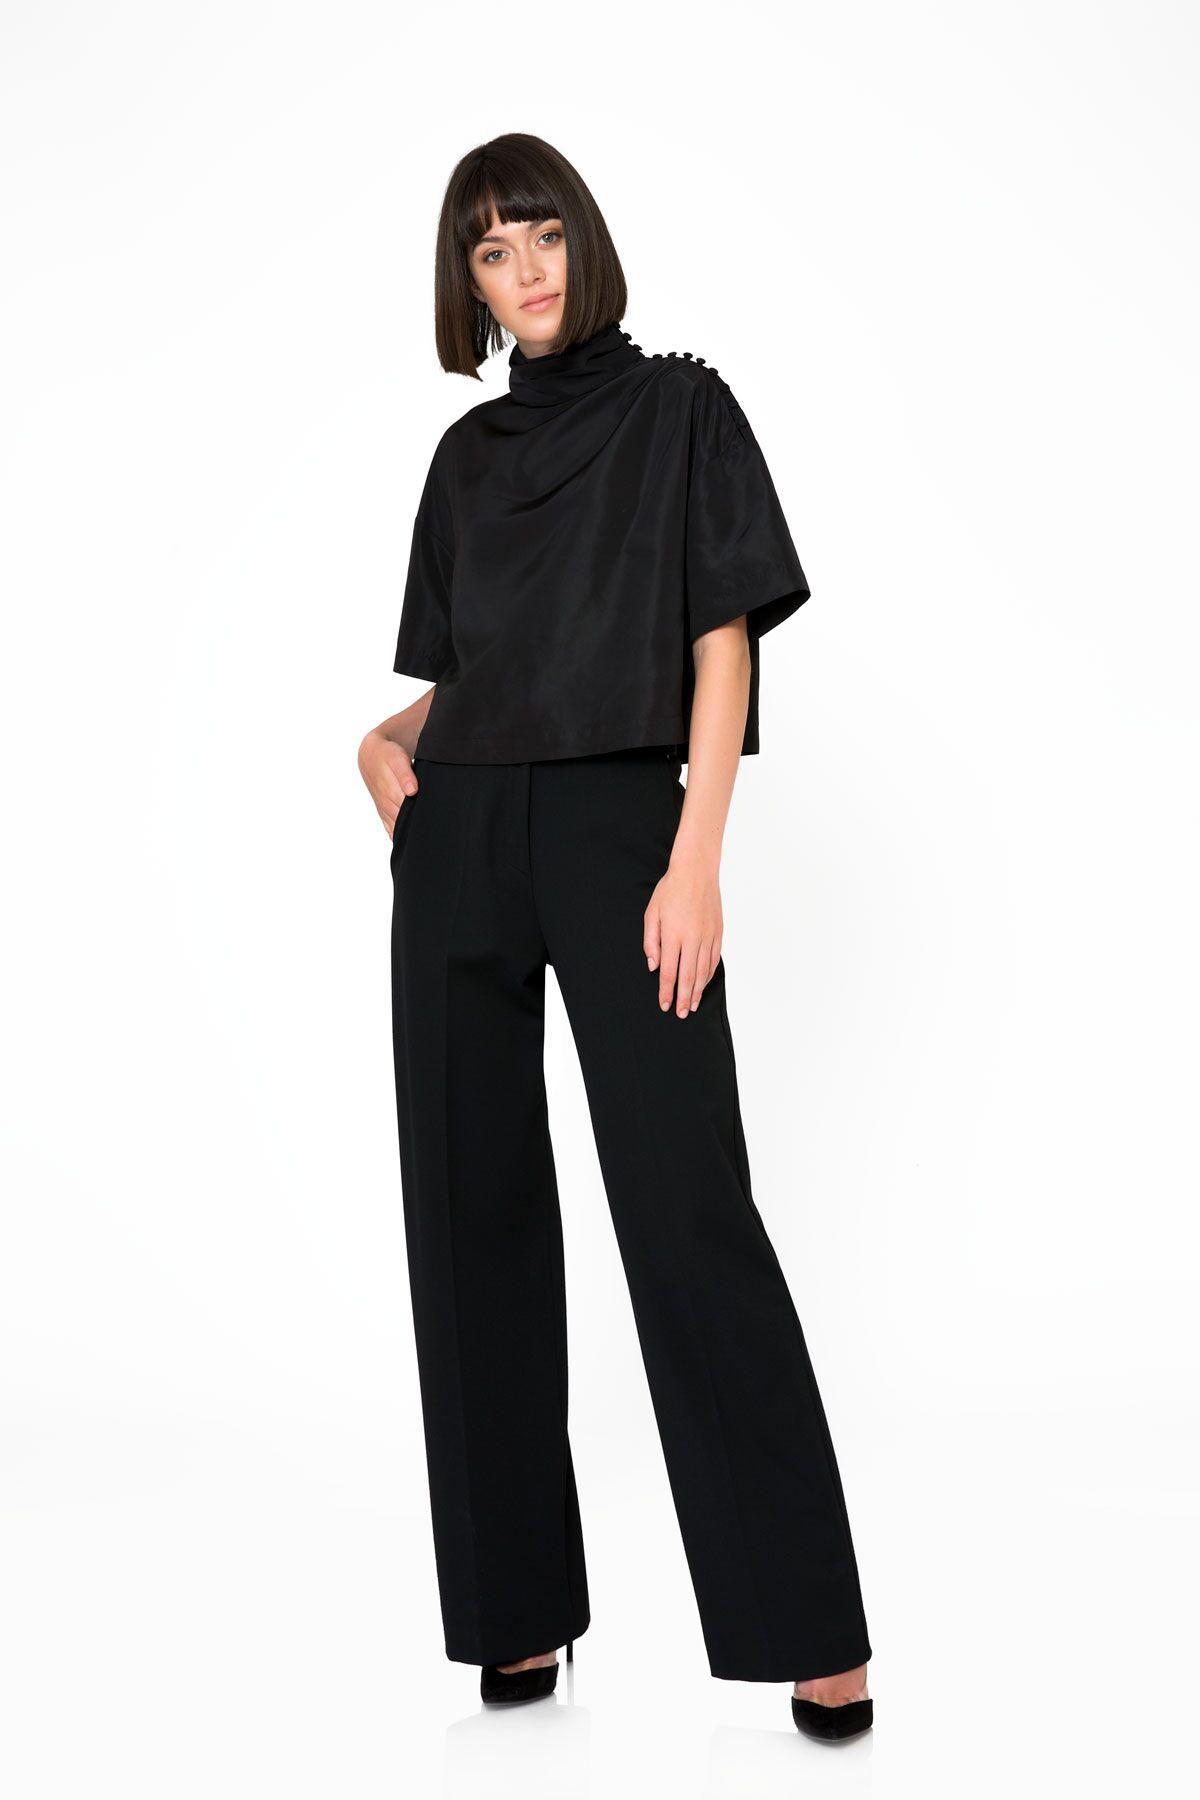 Yüksek Bel Siyah Kumaş Pantolon